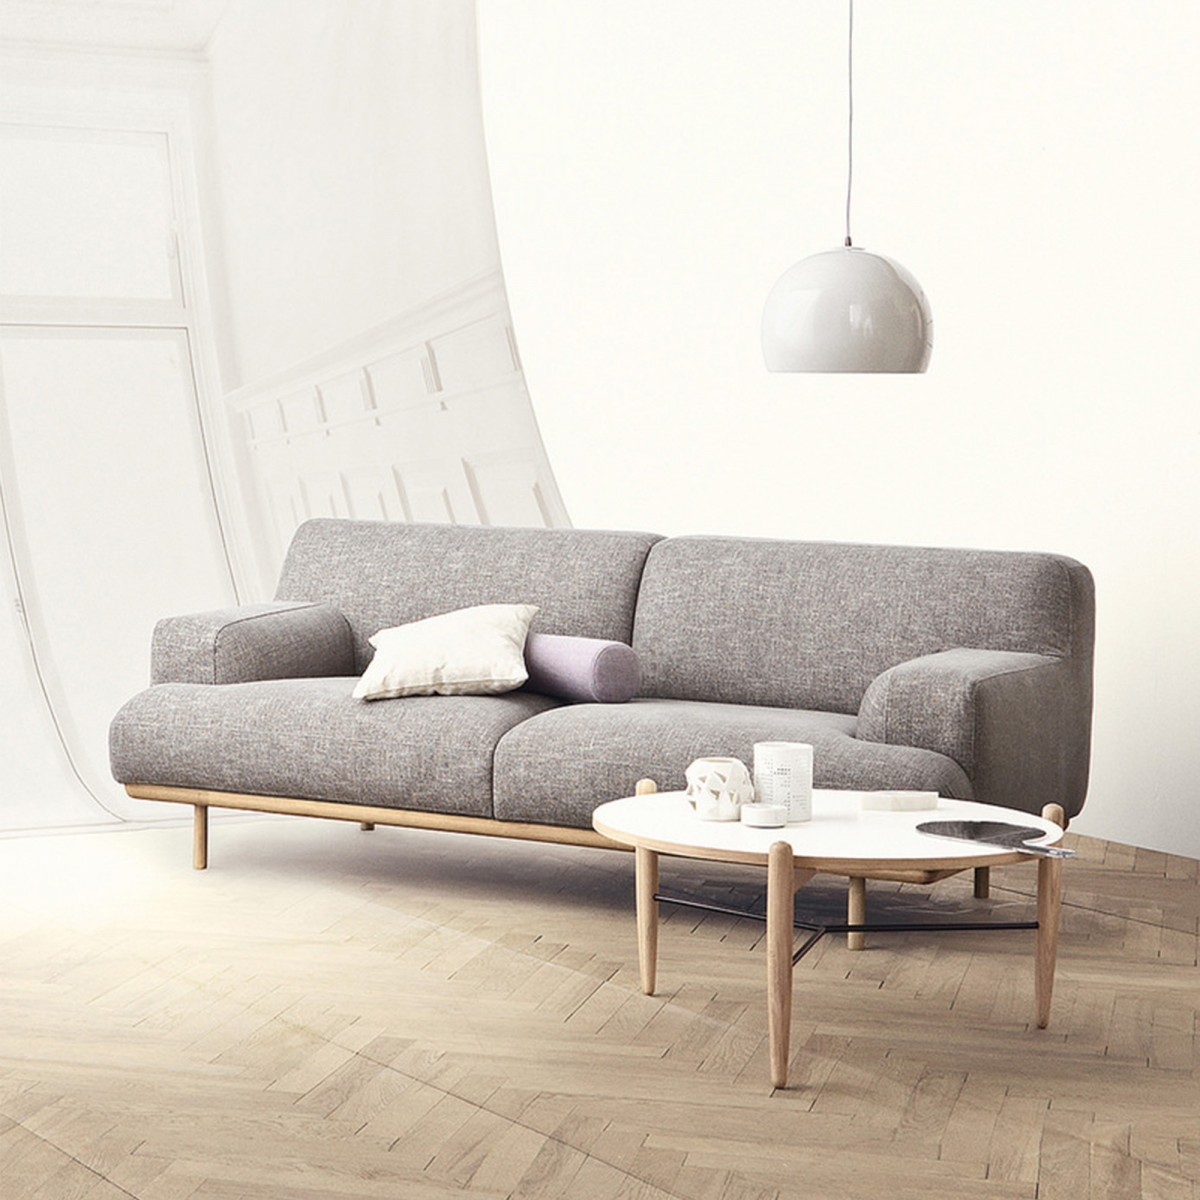 2 seat chairs art deco chair madison sofa seats 1 bolia